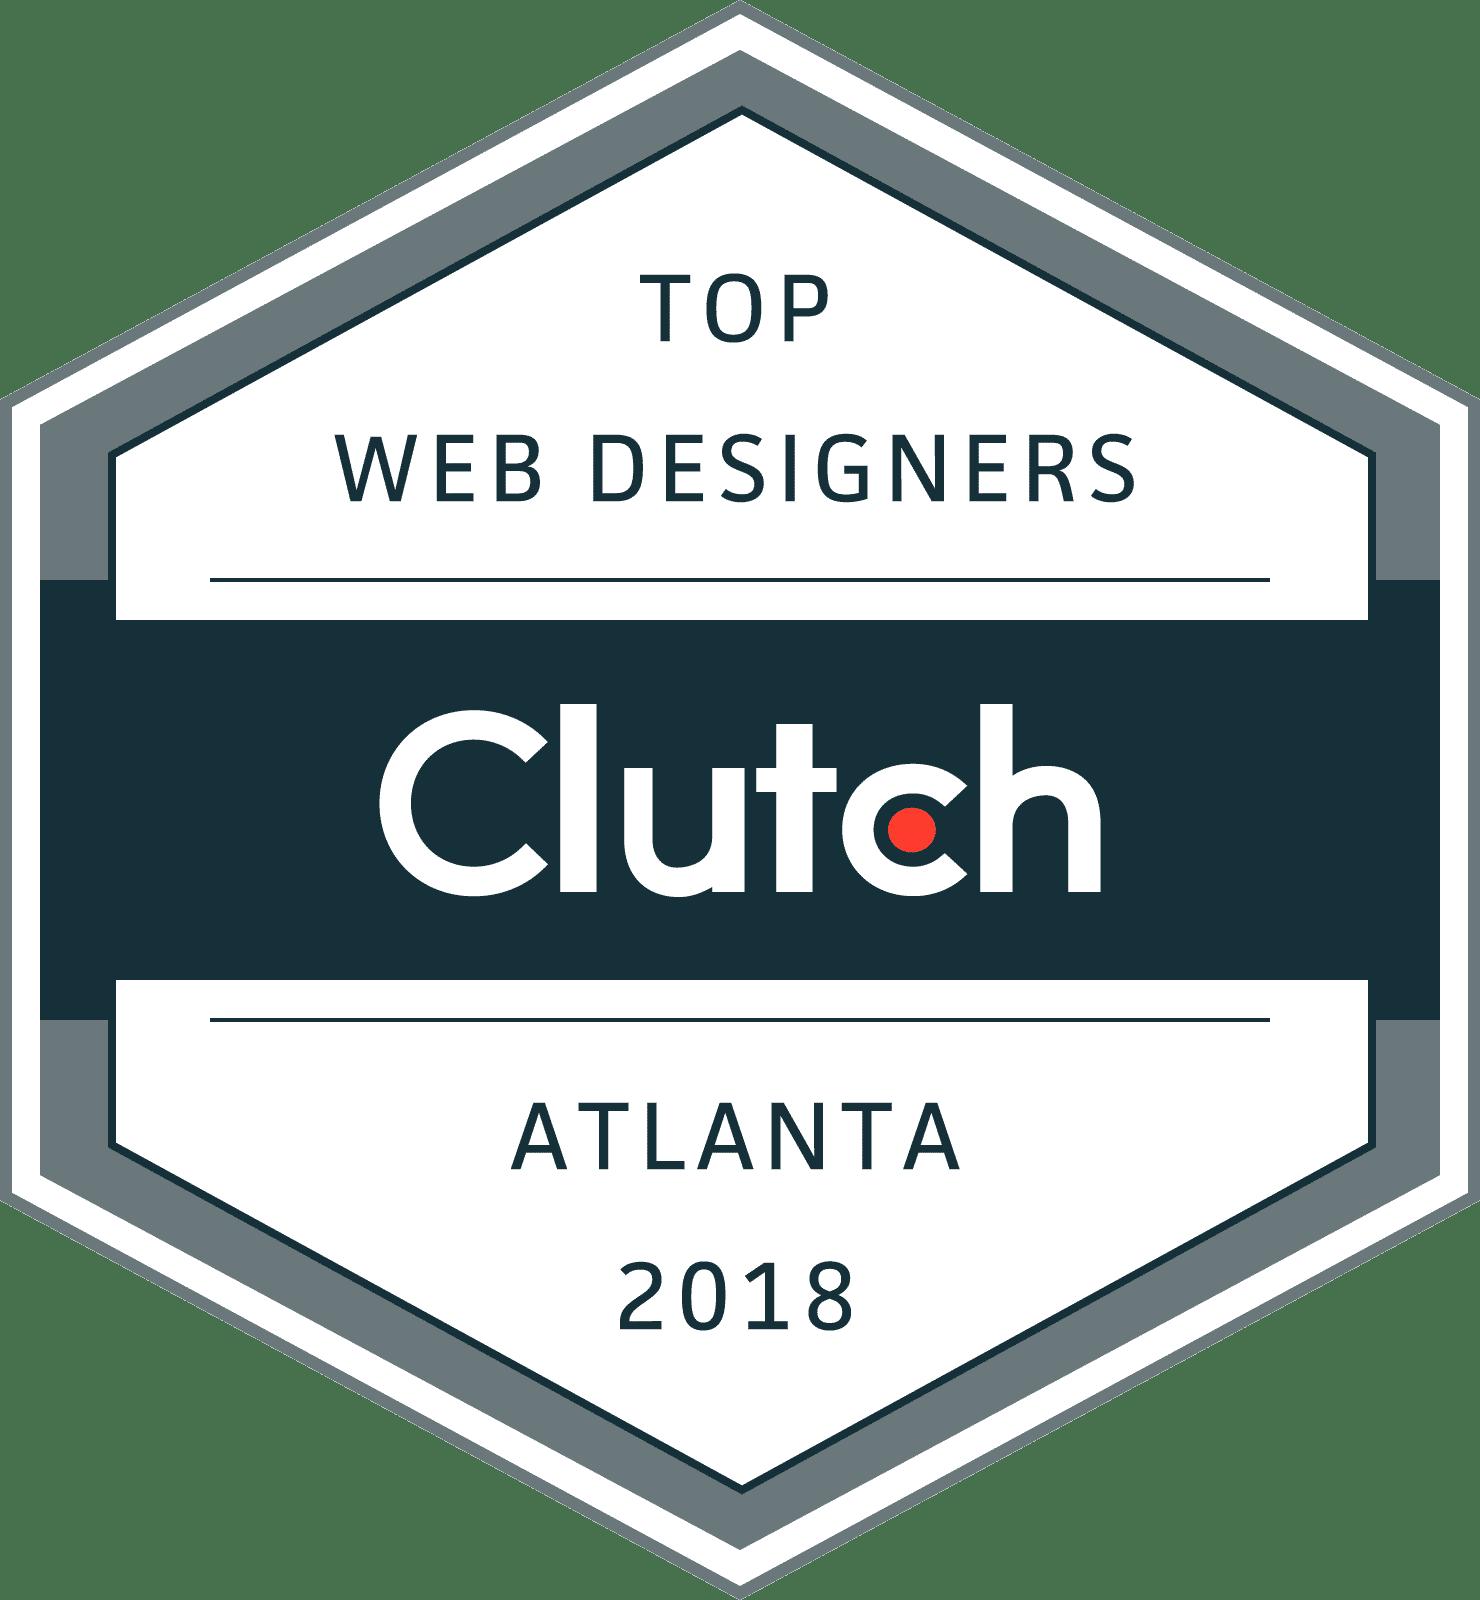 Clutch Top Atlanta Web Design Company 2018